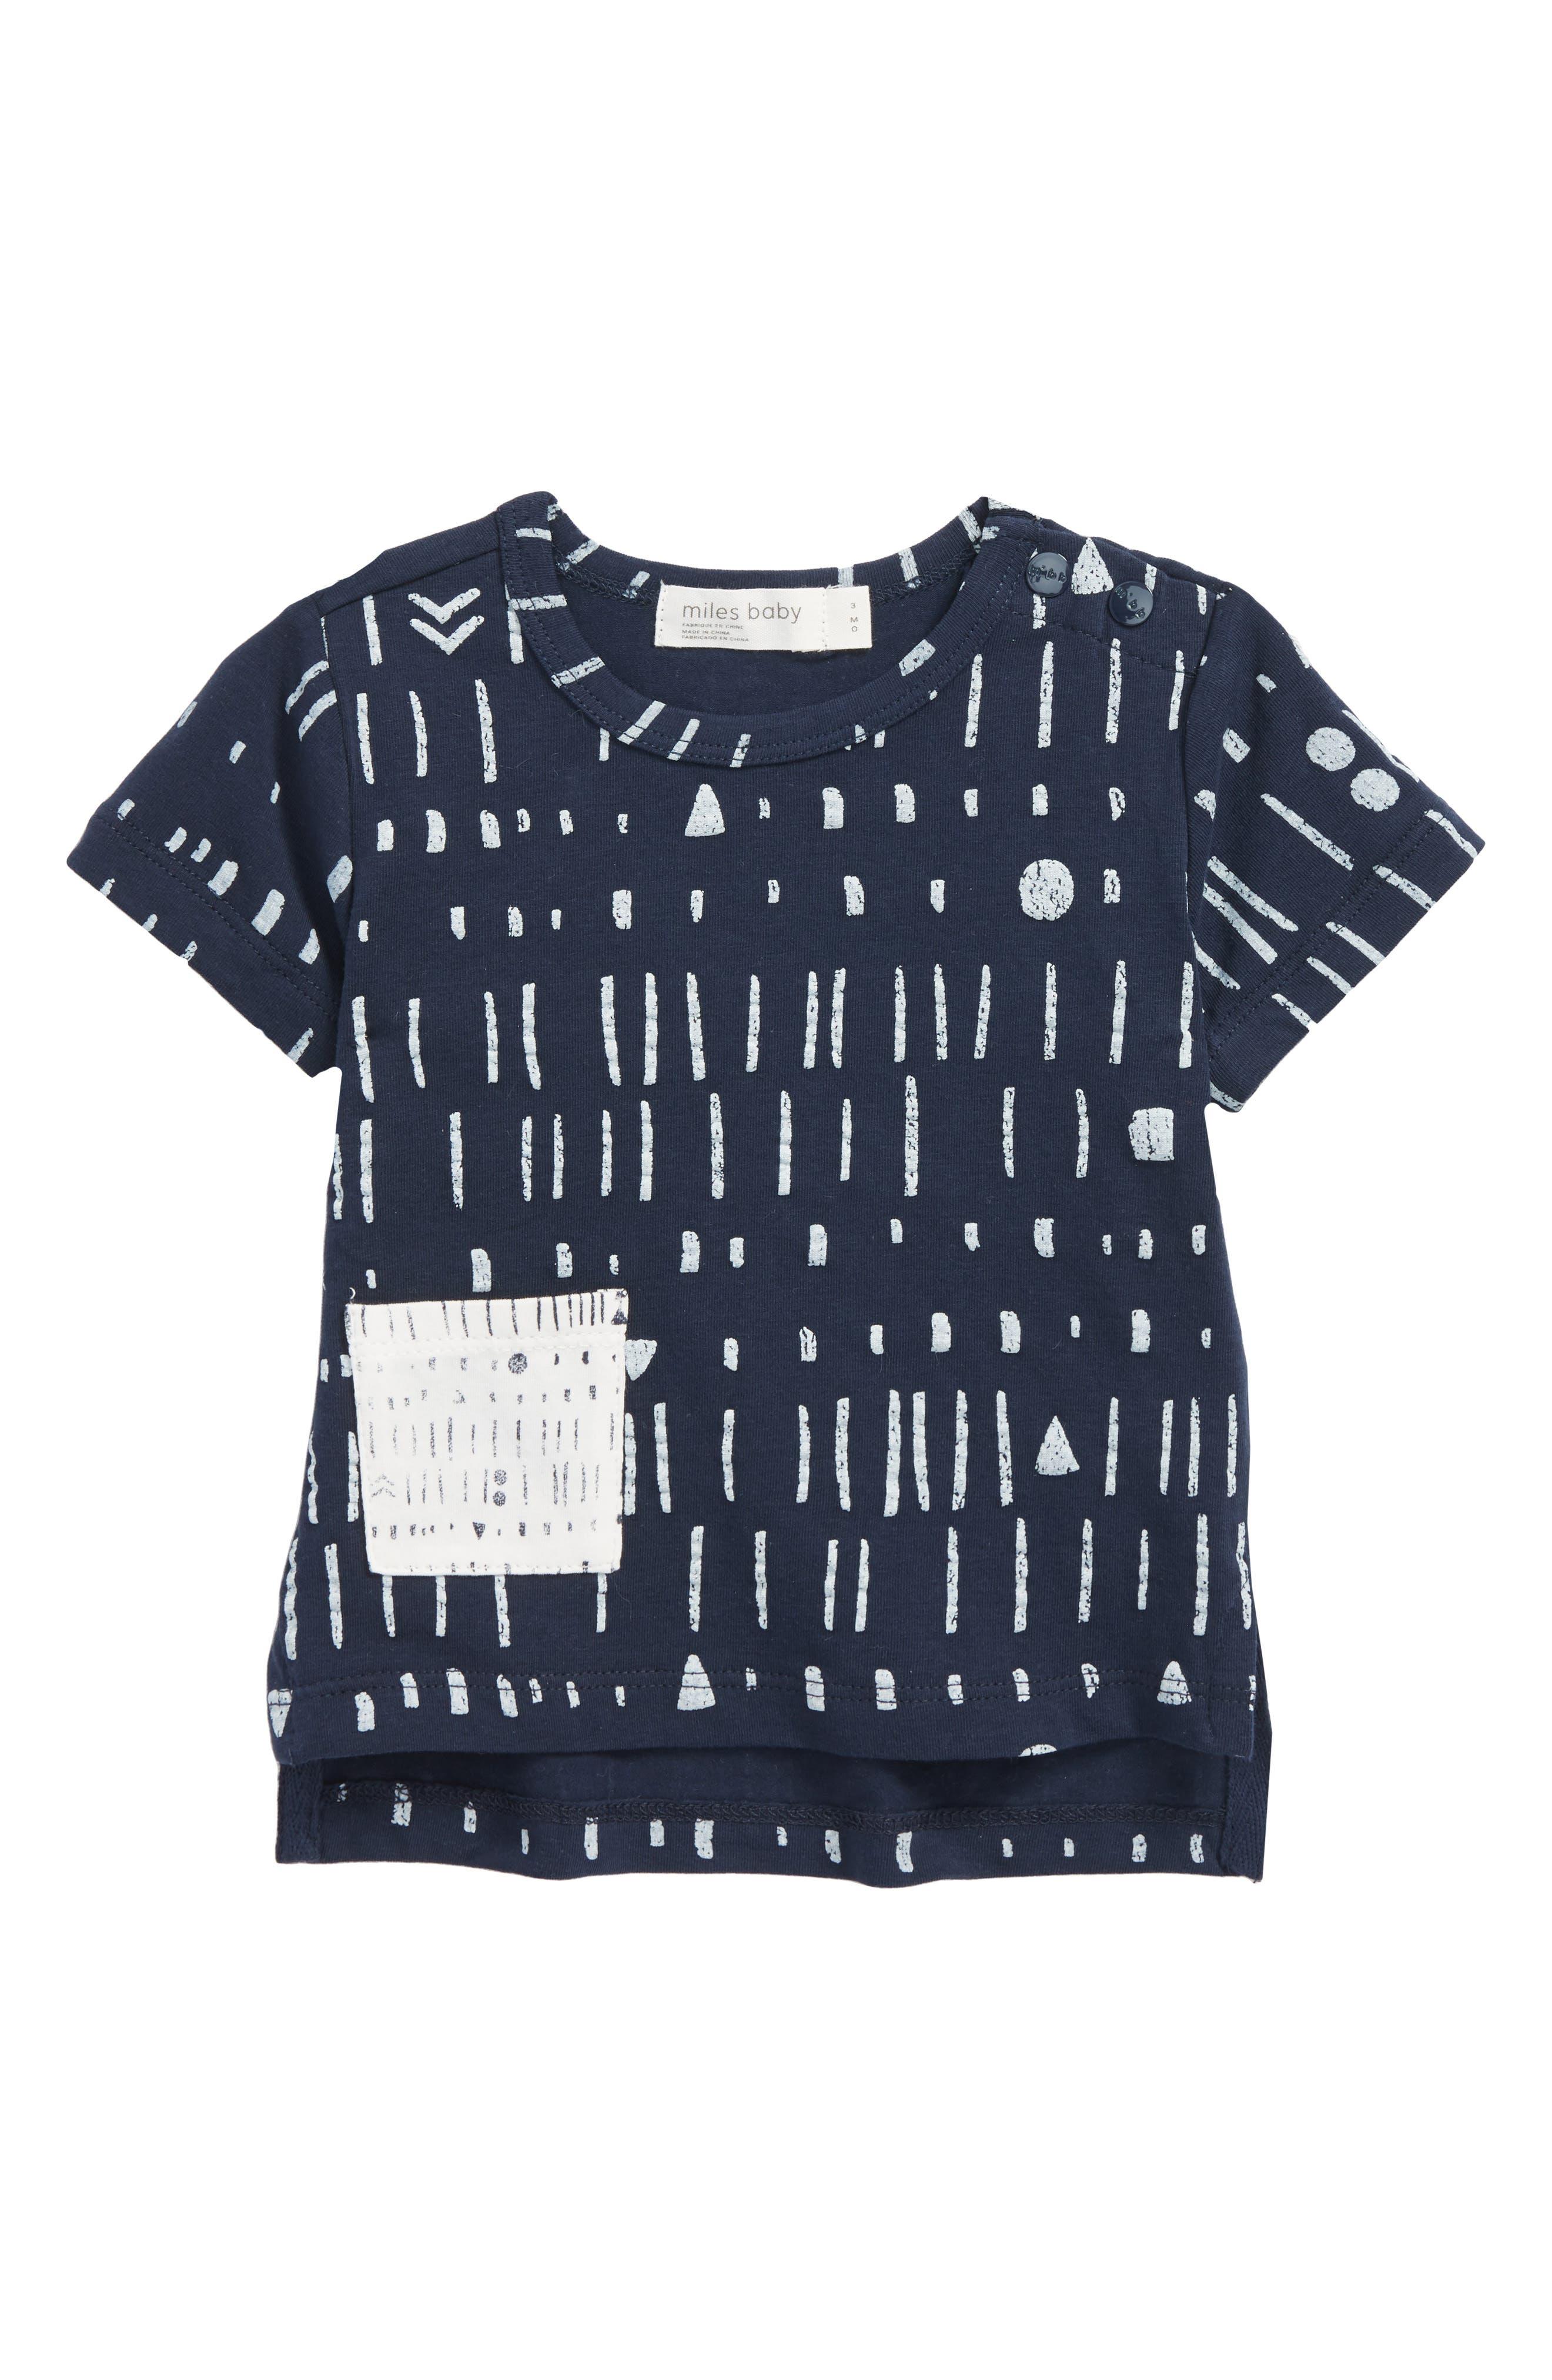 Miles Baby Pocket T-Shirt (Baby Boys)